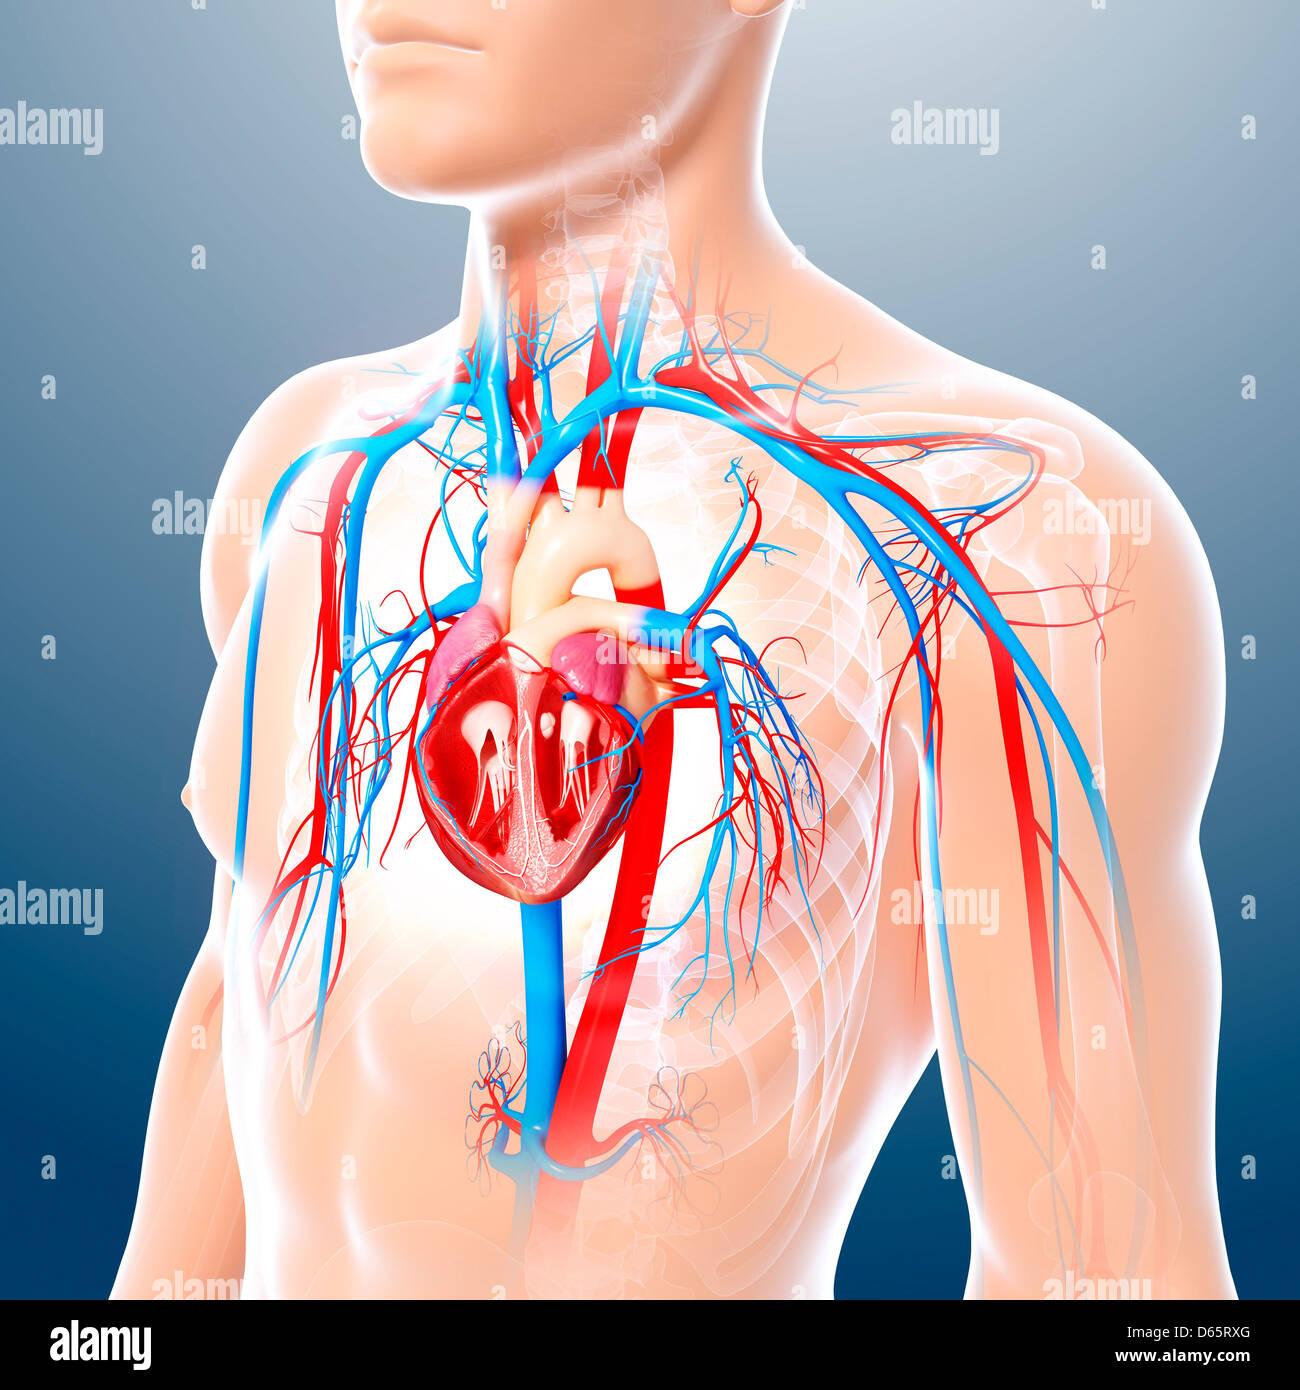 Male Chest Anatomy Heart Veins Stockfotos Male Chest Anatomy Heart